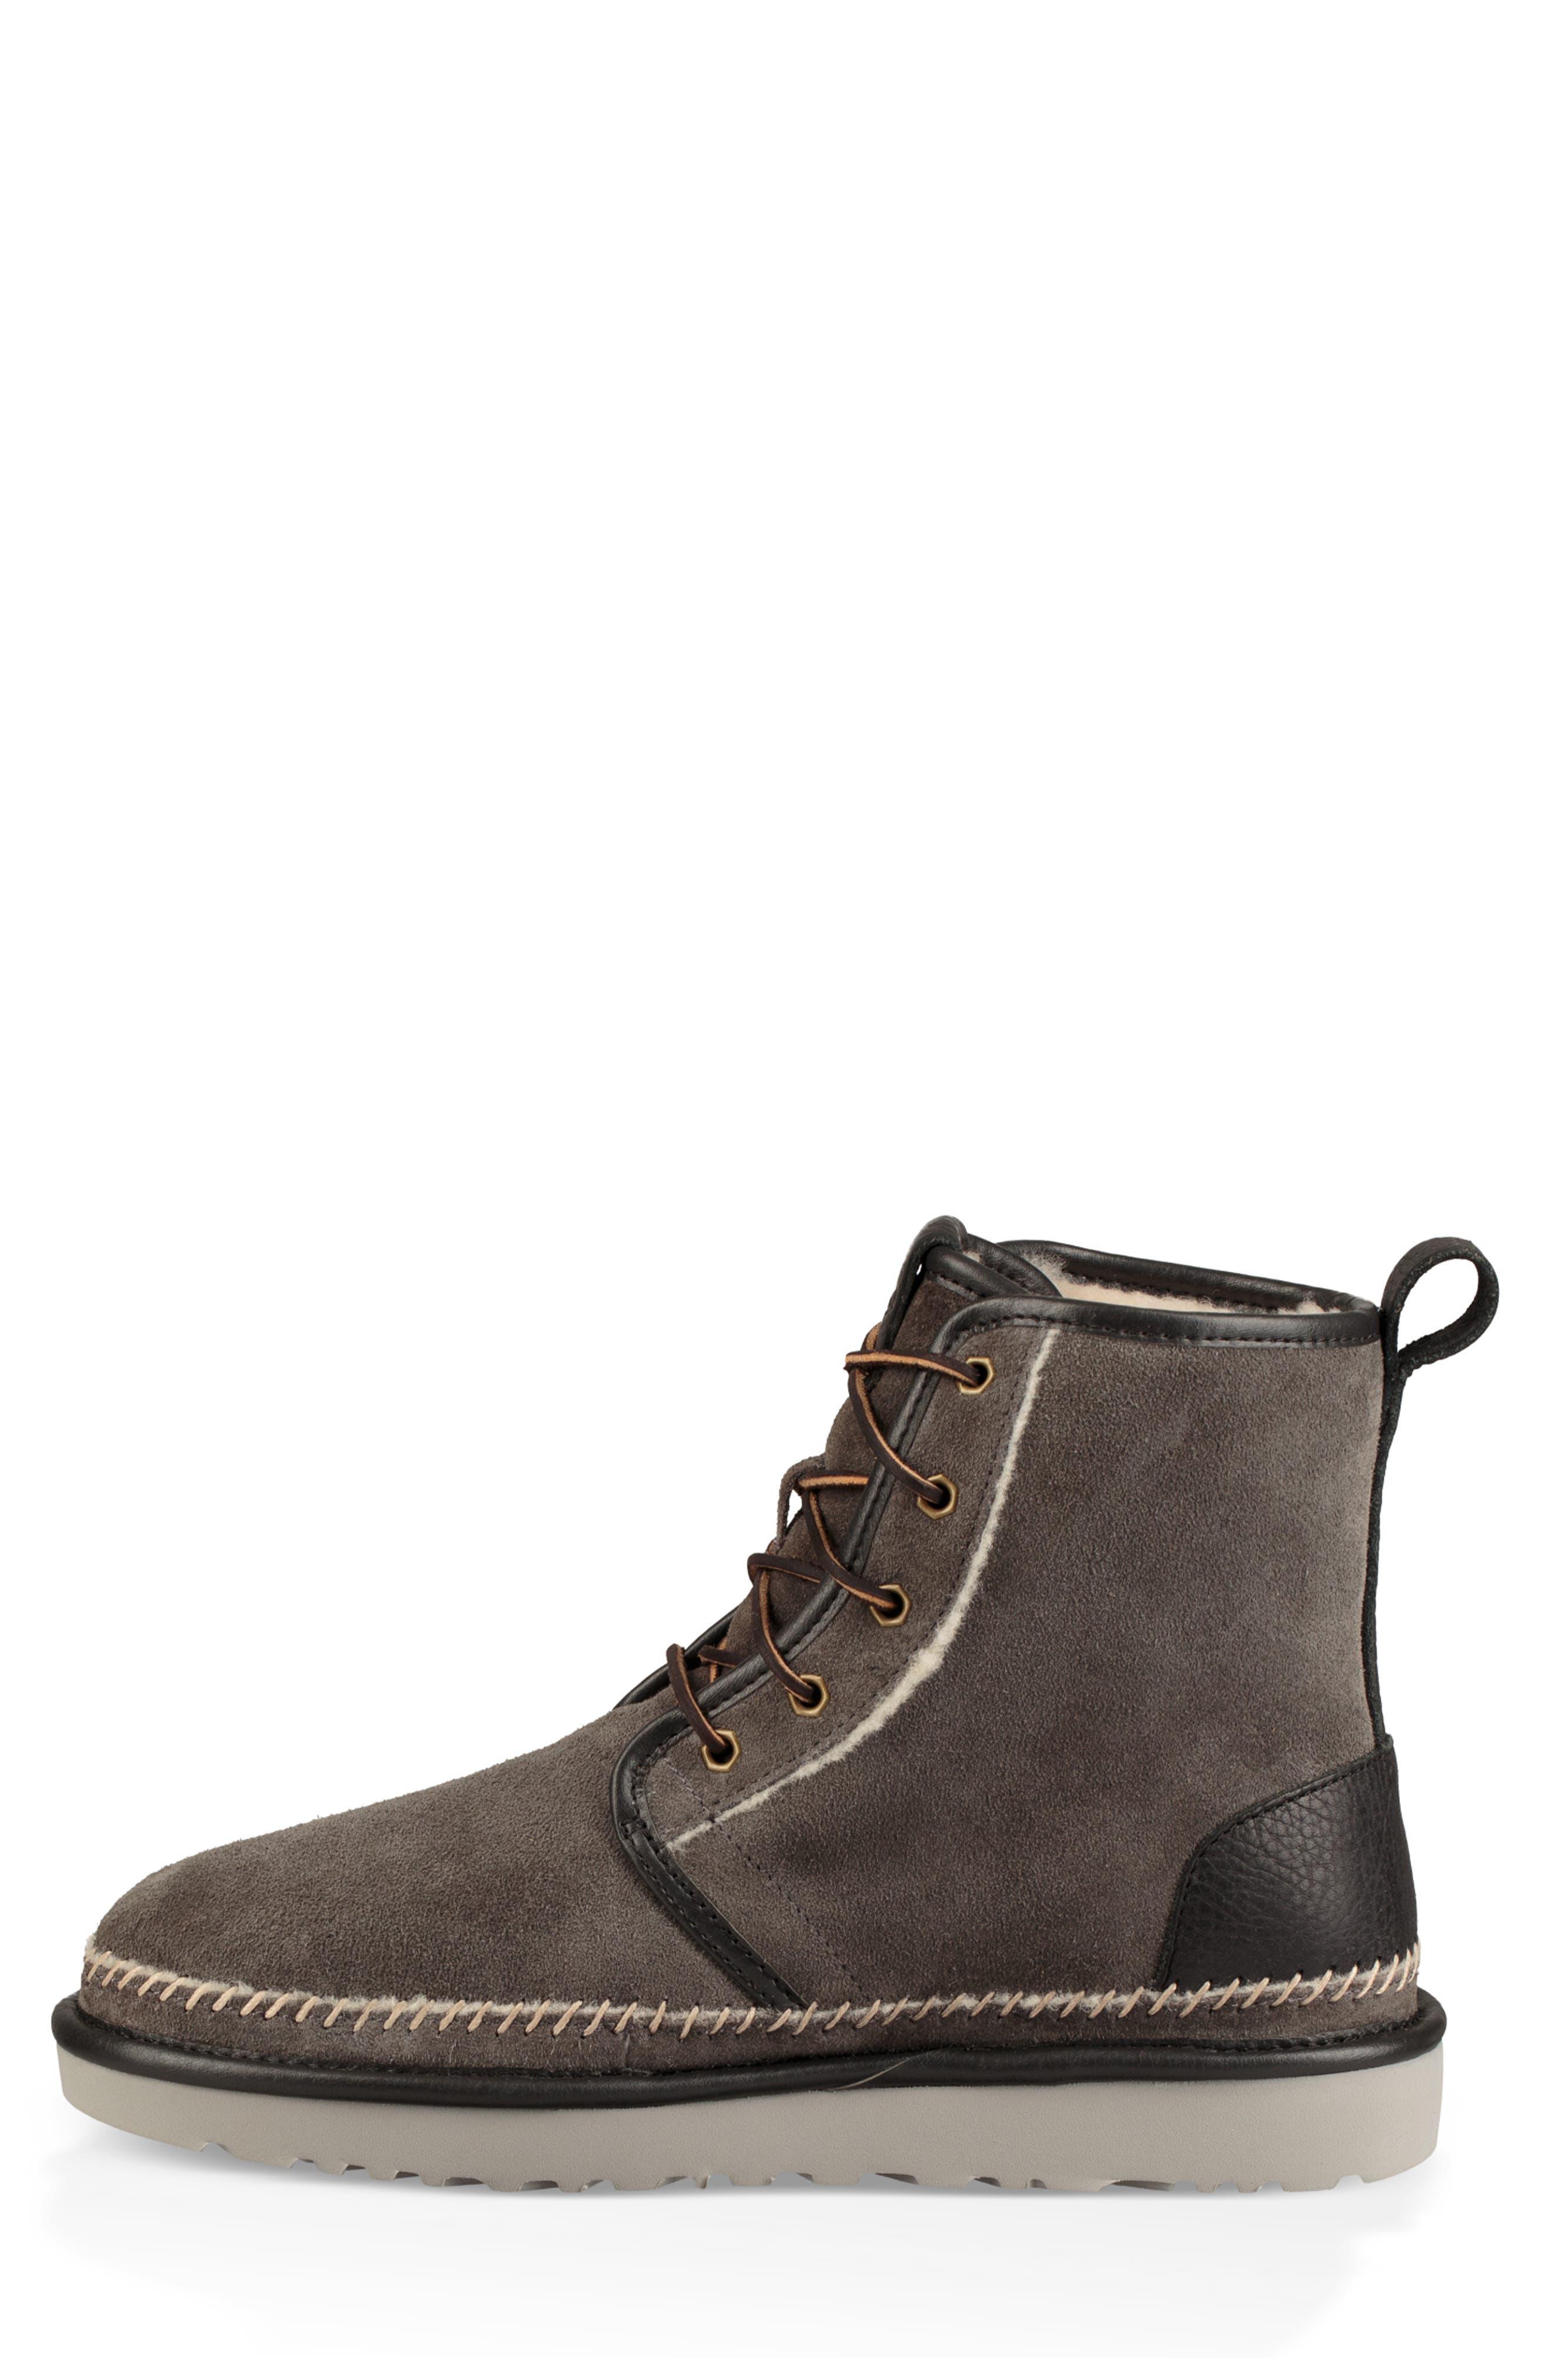 Harkley Stitch Plain Toe Boot,                             Alternate thumbnail 6, color,                             DARK GREY